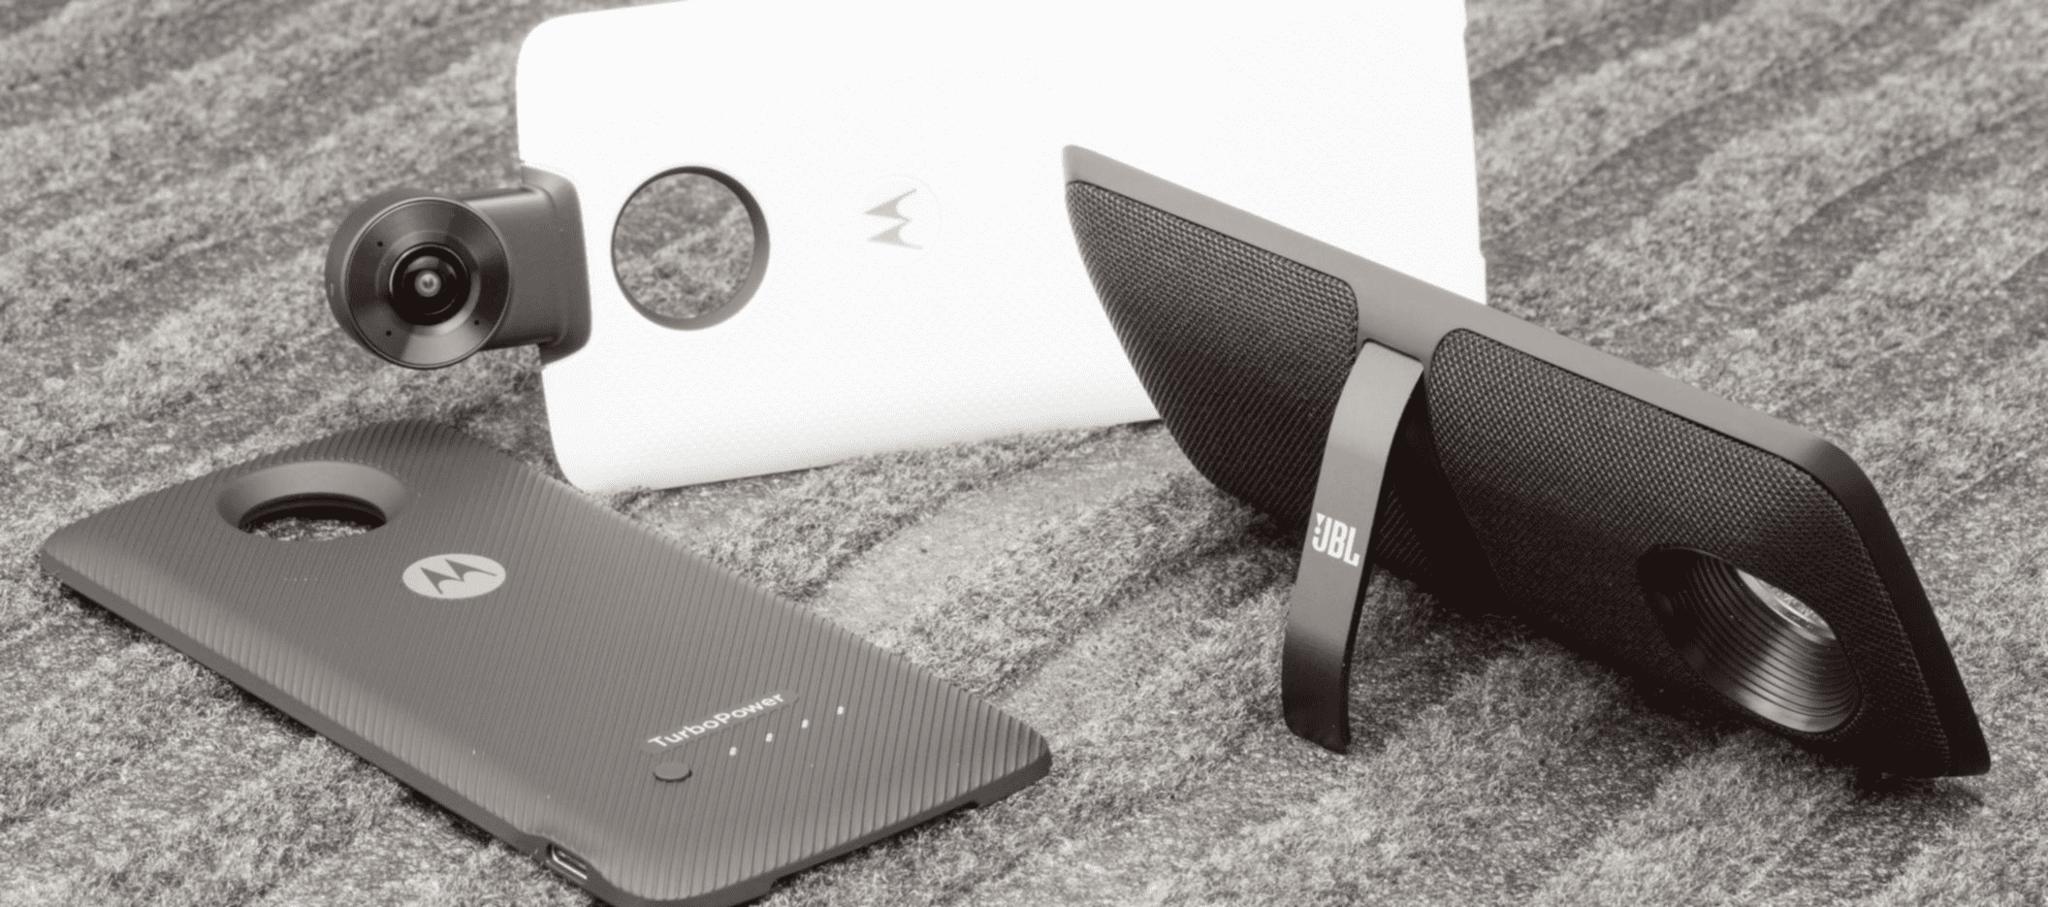 Motorola Moto Z2 (Force Edition) Review – Moto Z2 Force Has Lots of Power, Plus Mods